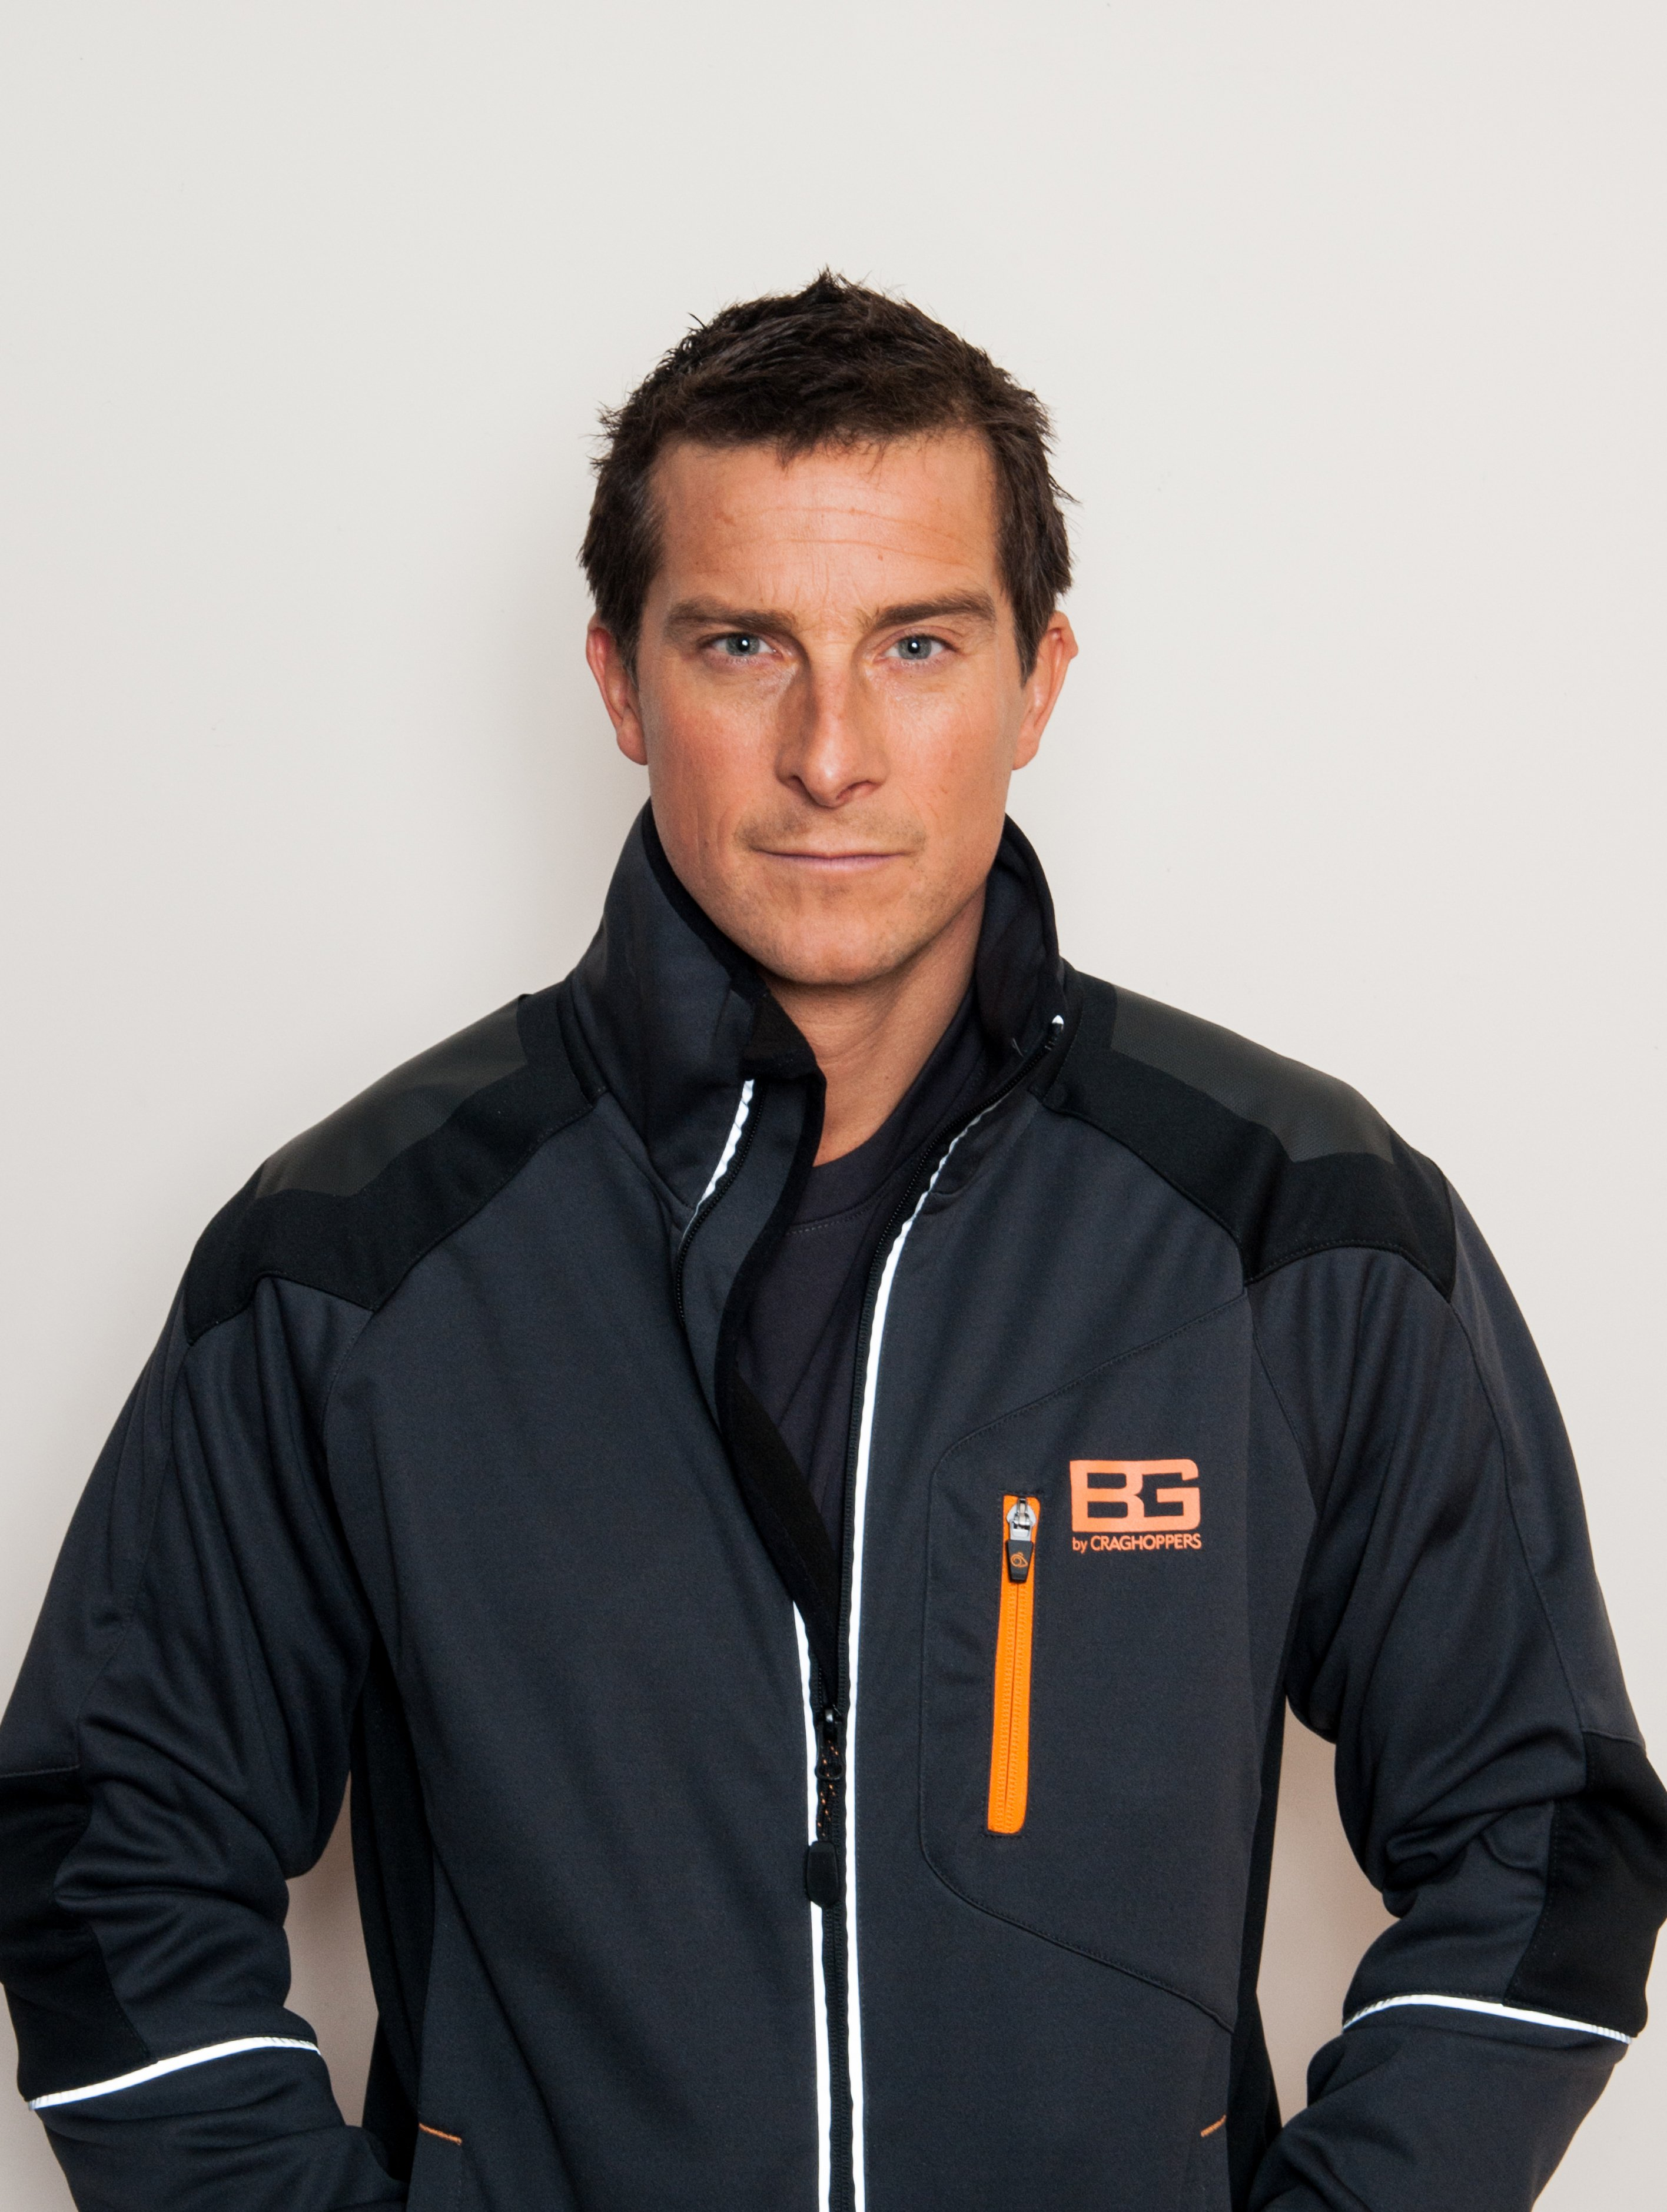 Review: Bear Grylls Survivor Softshell Jacket